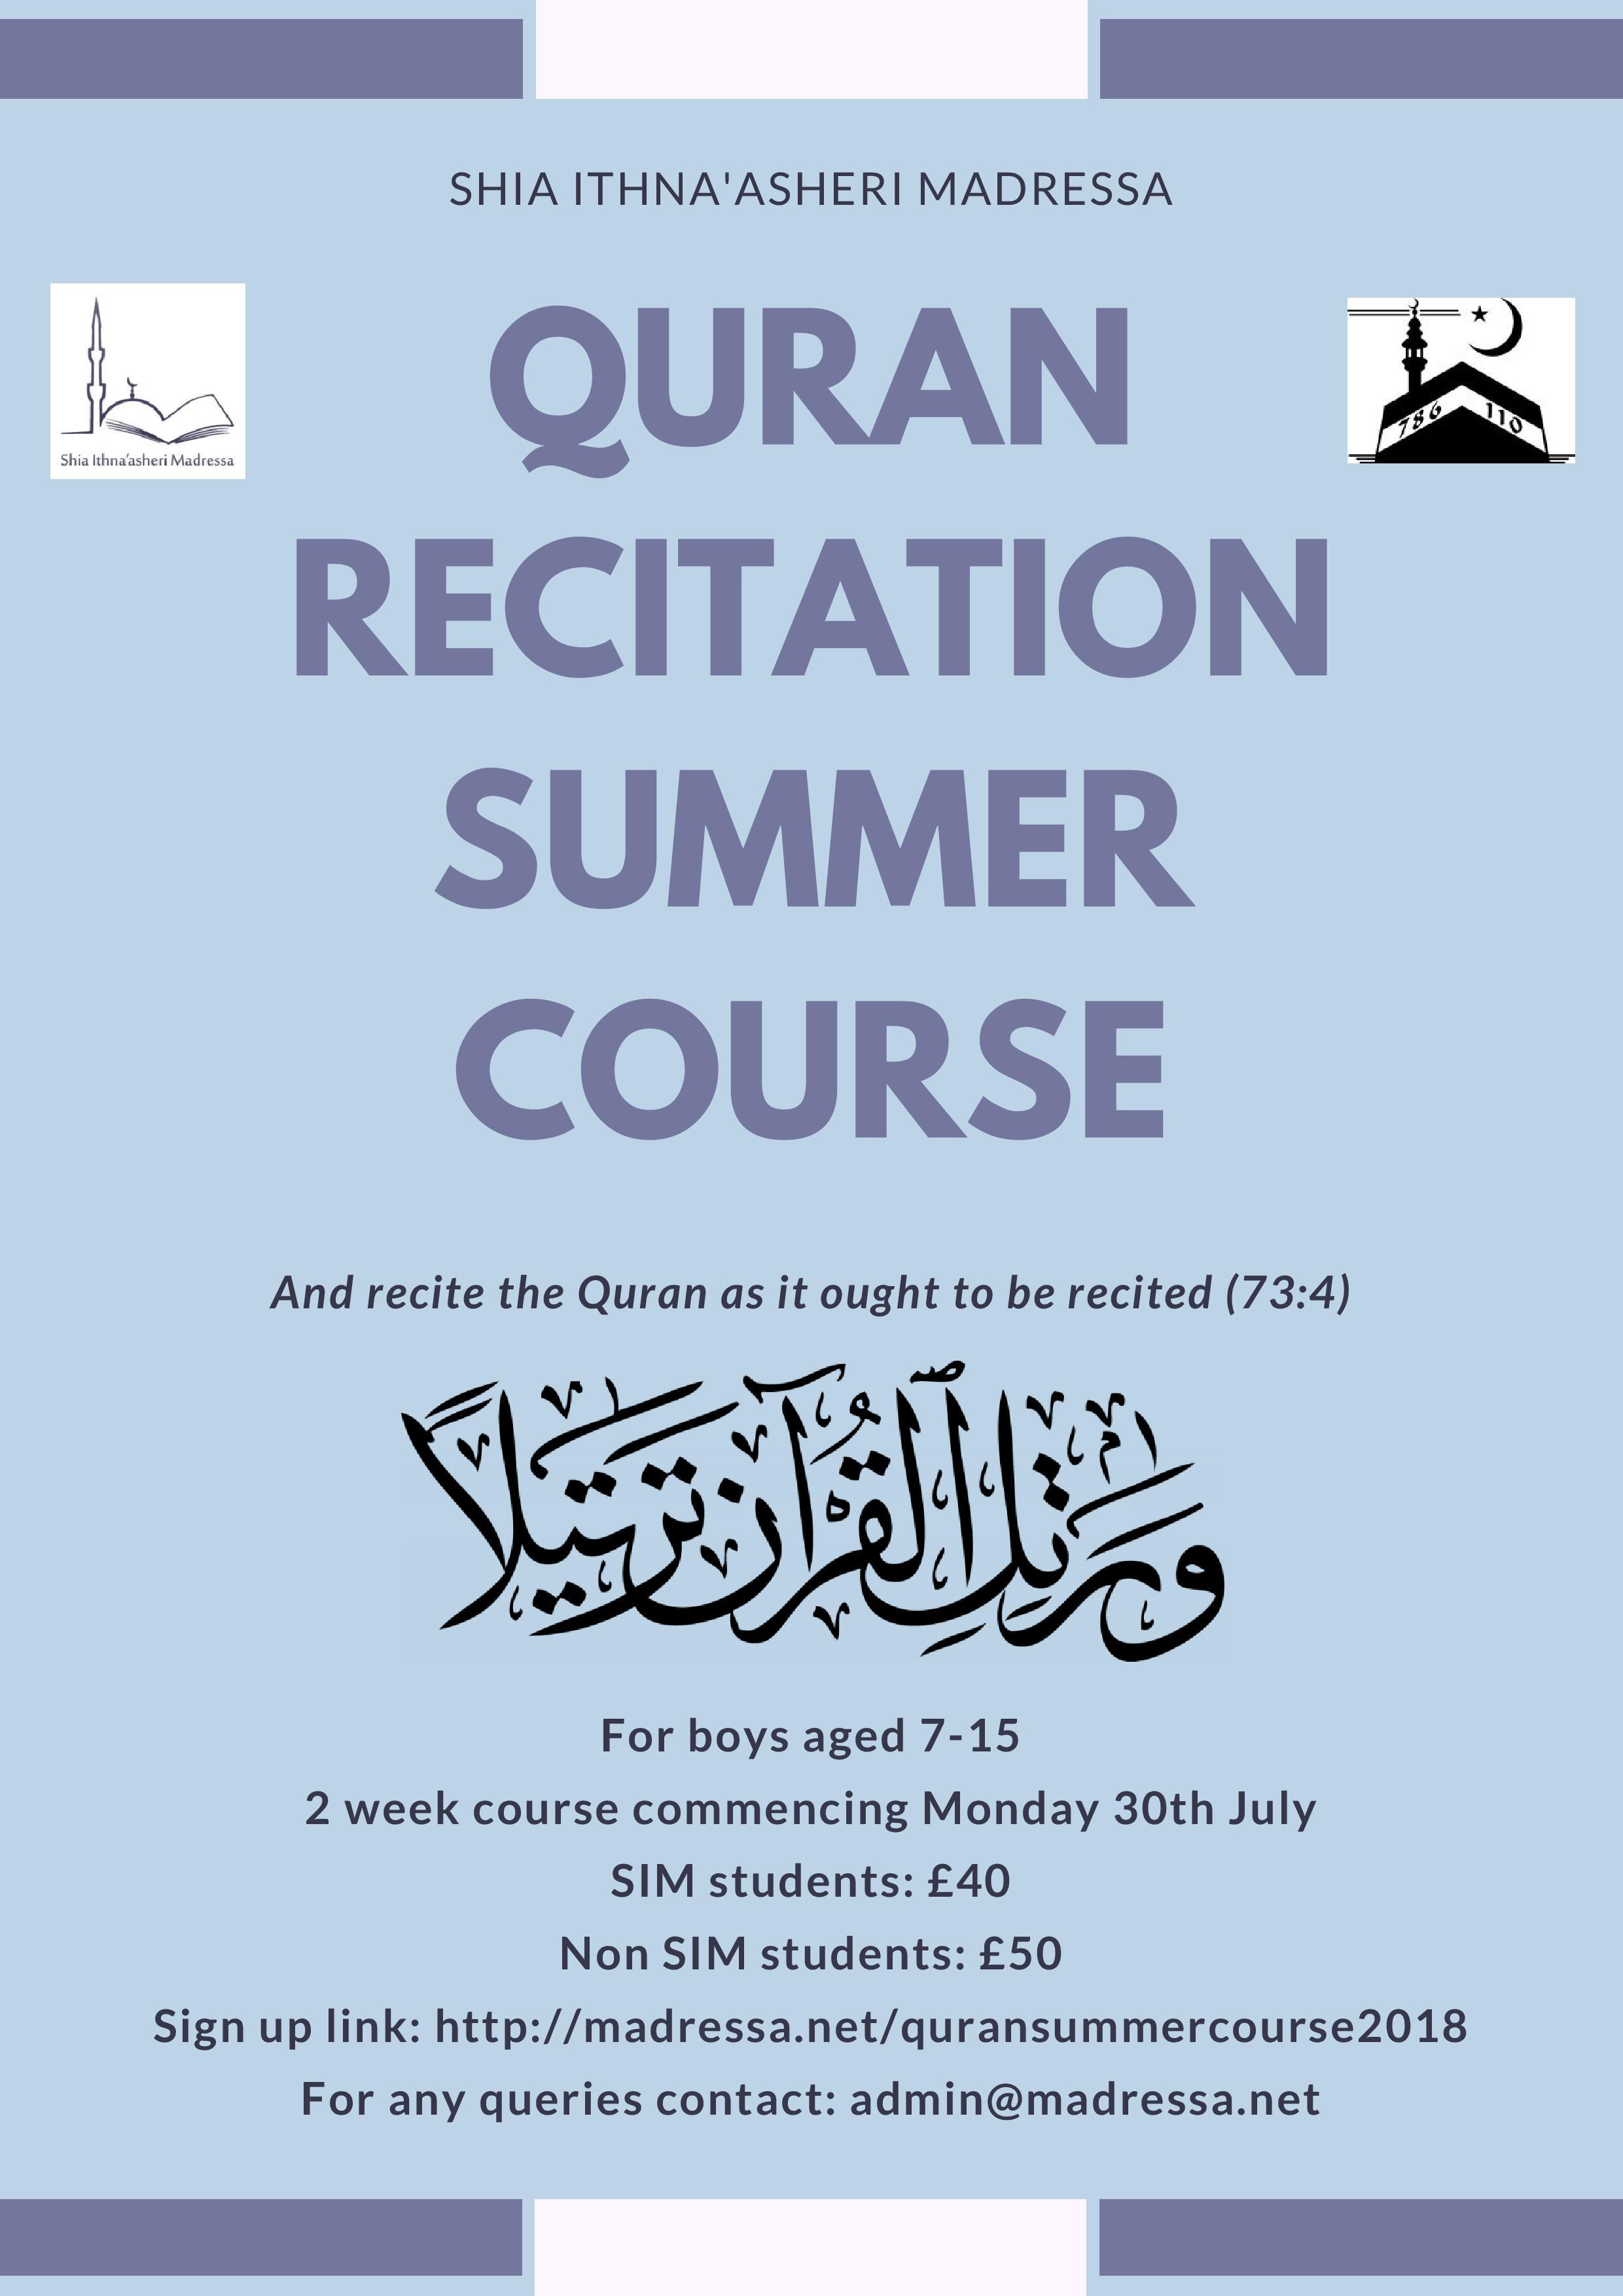 Quran Summer Course 2018